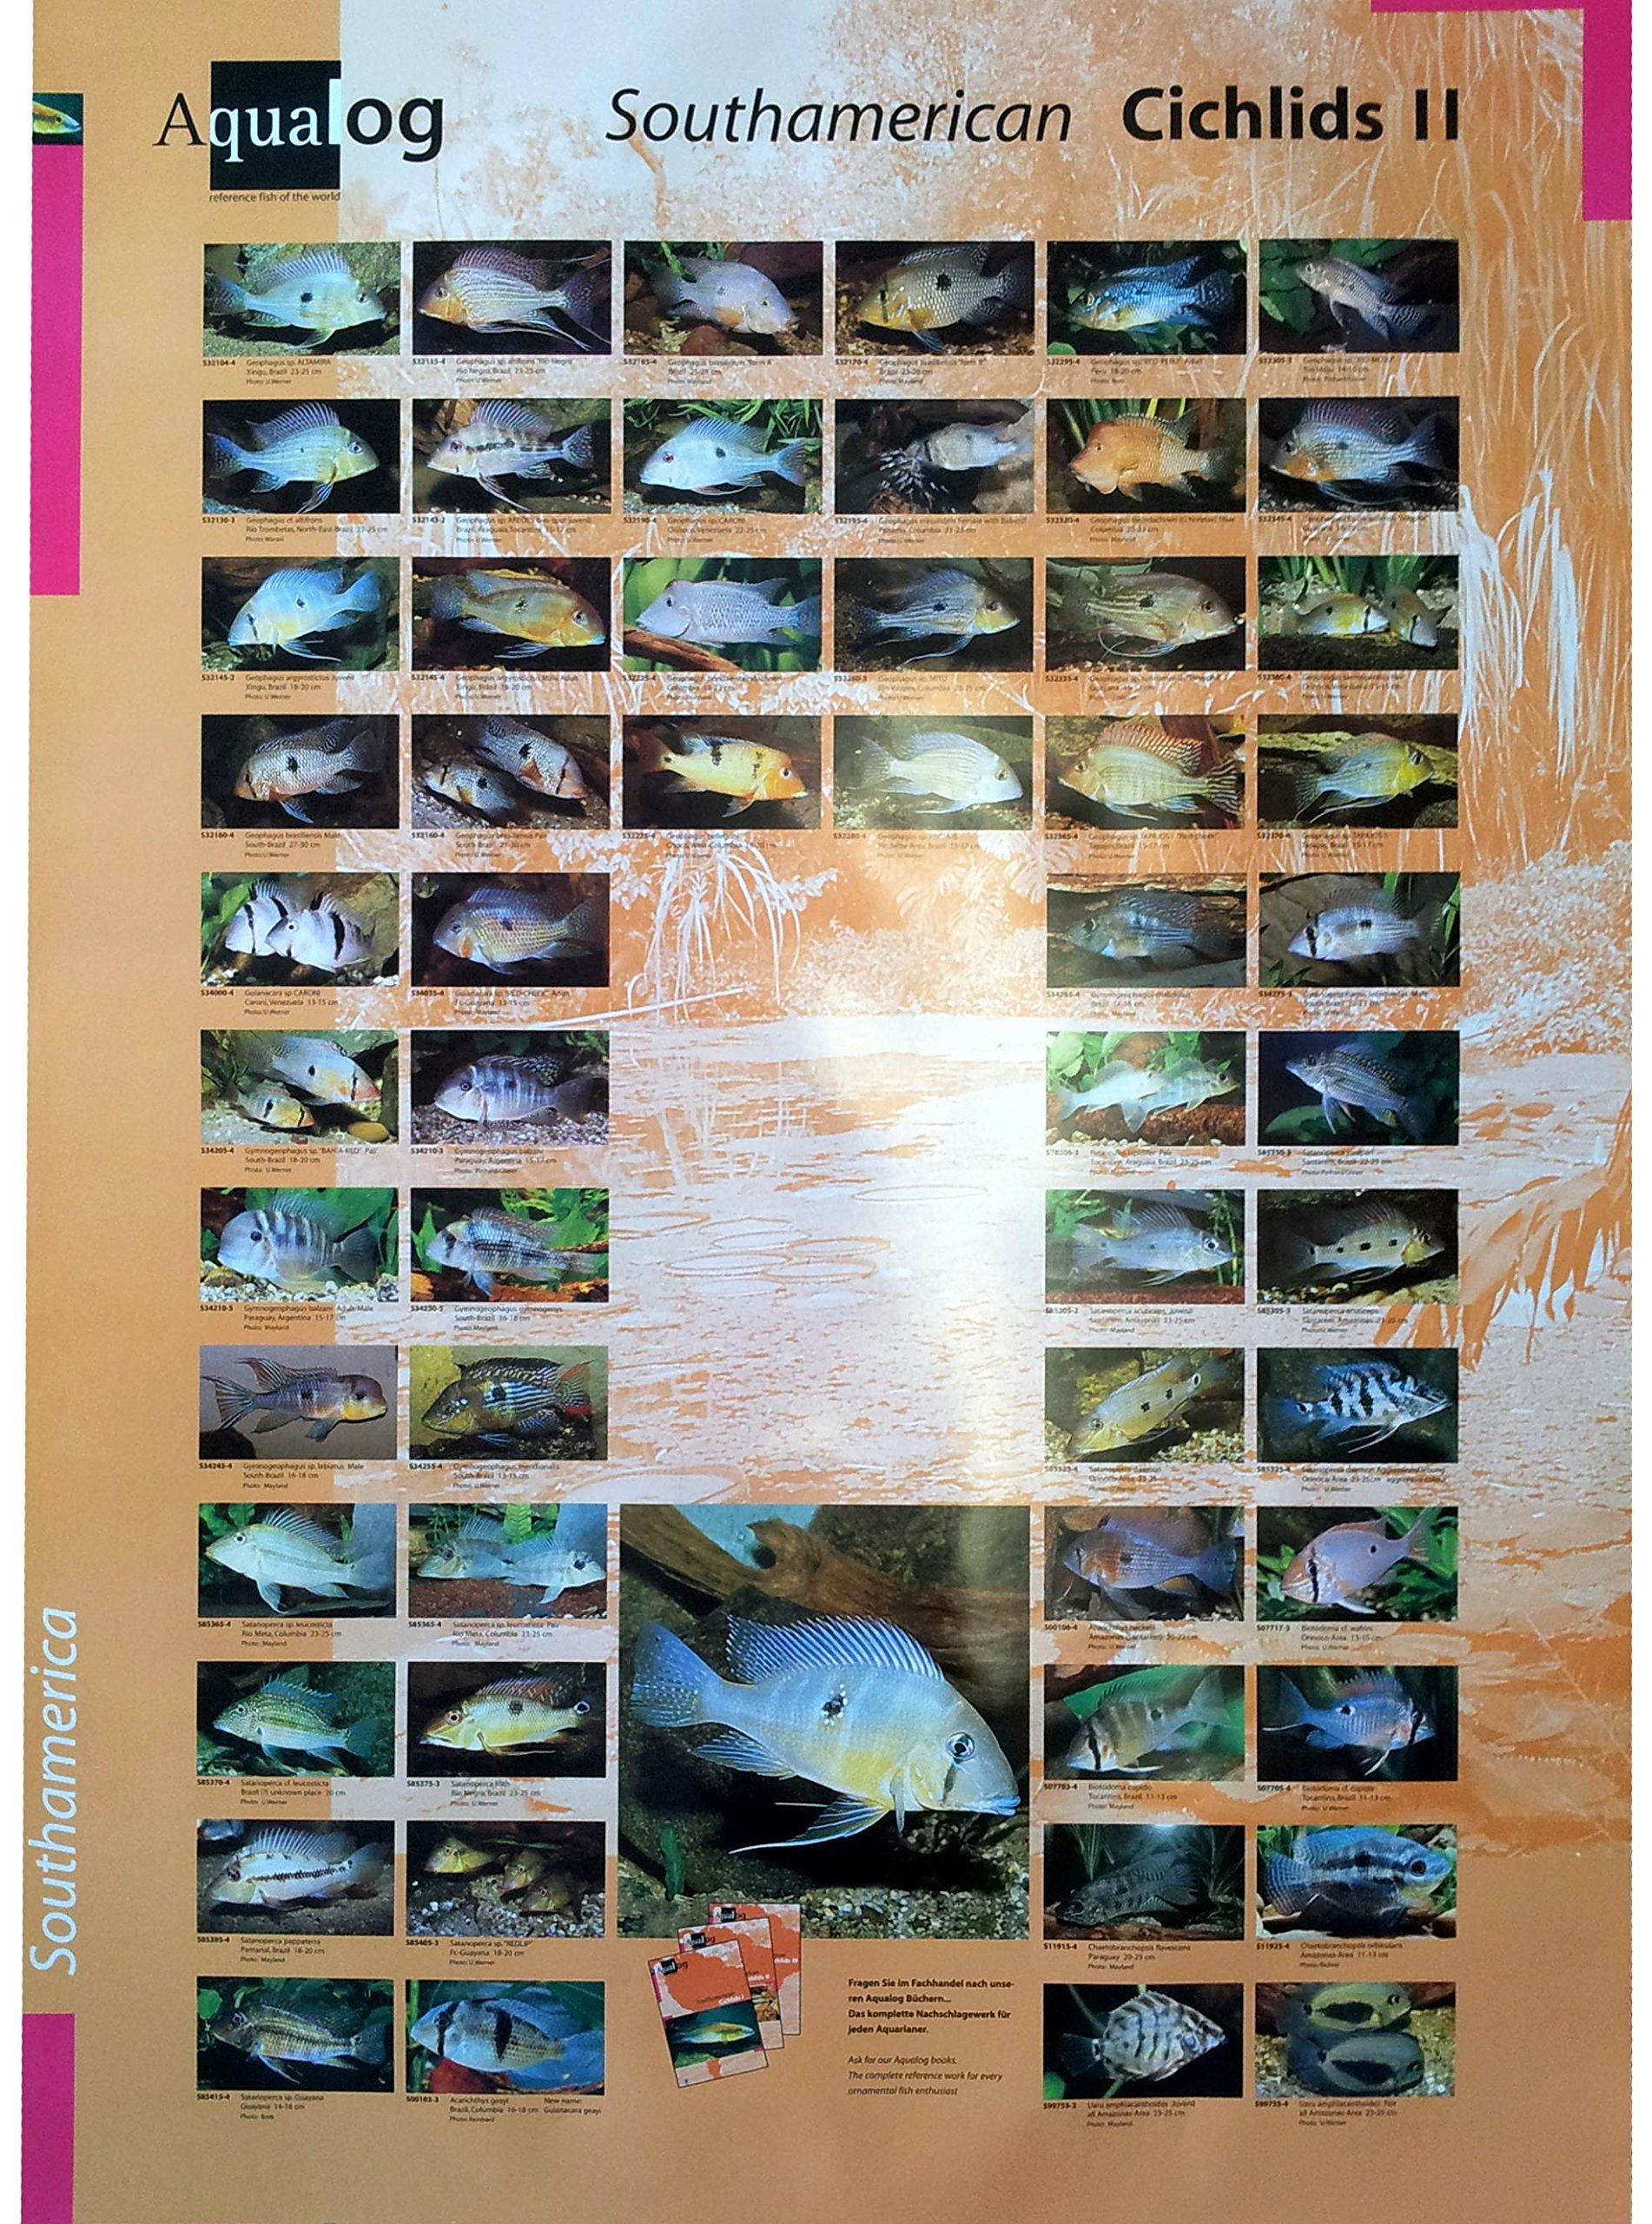 AQUALOG: Poster Cichlids 2 (Geophagus/Eartheaters)